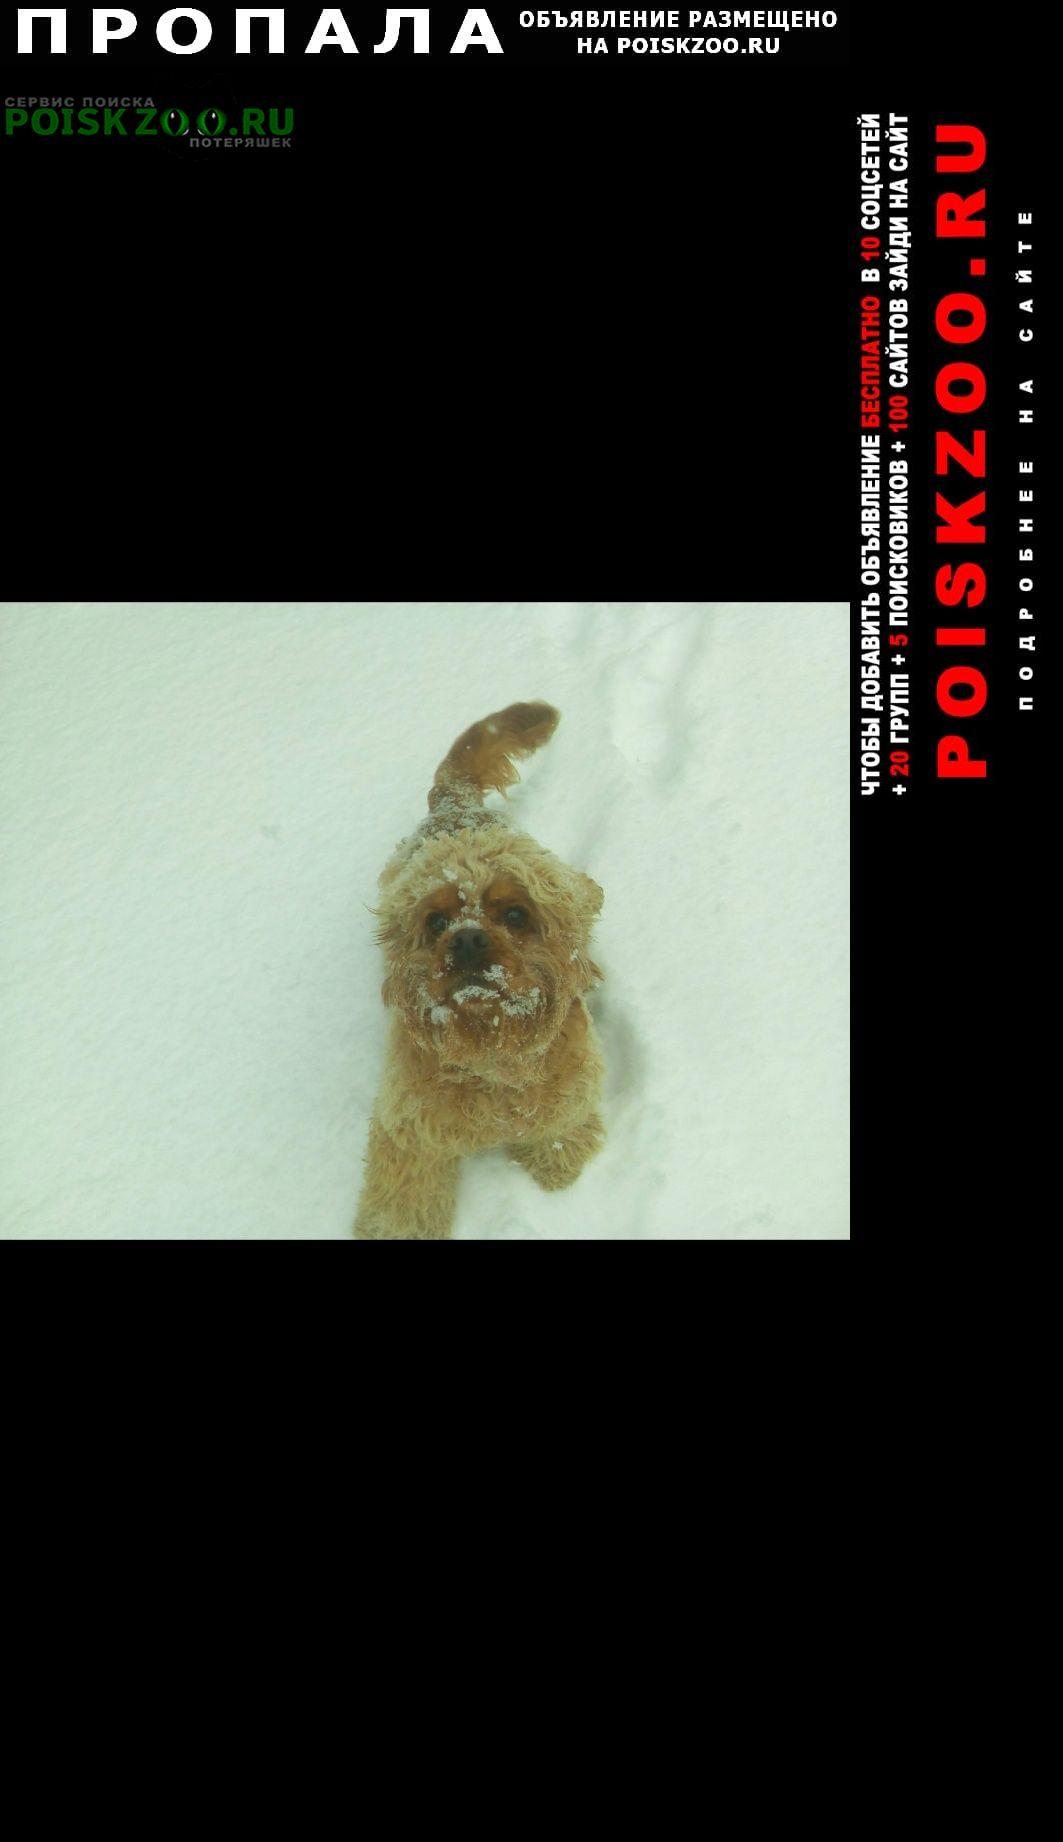 Пропала собака Ставрополь